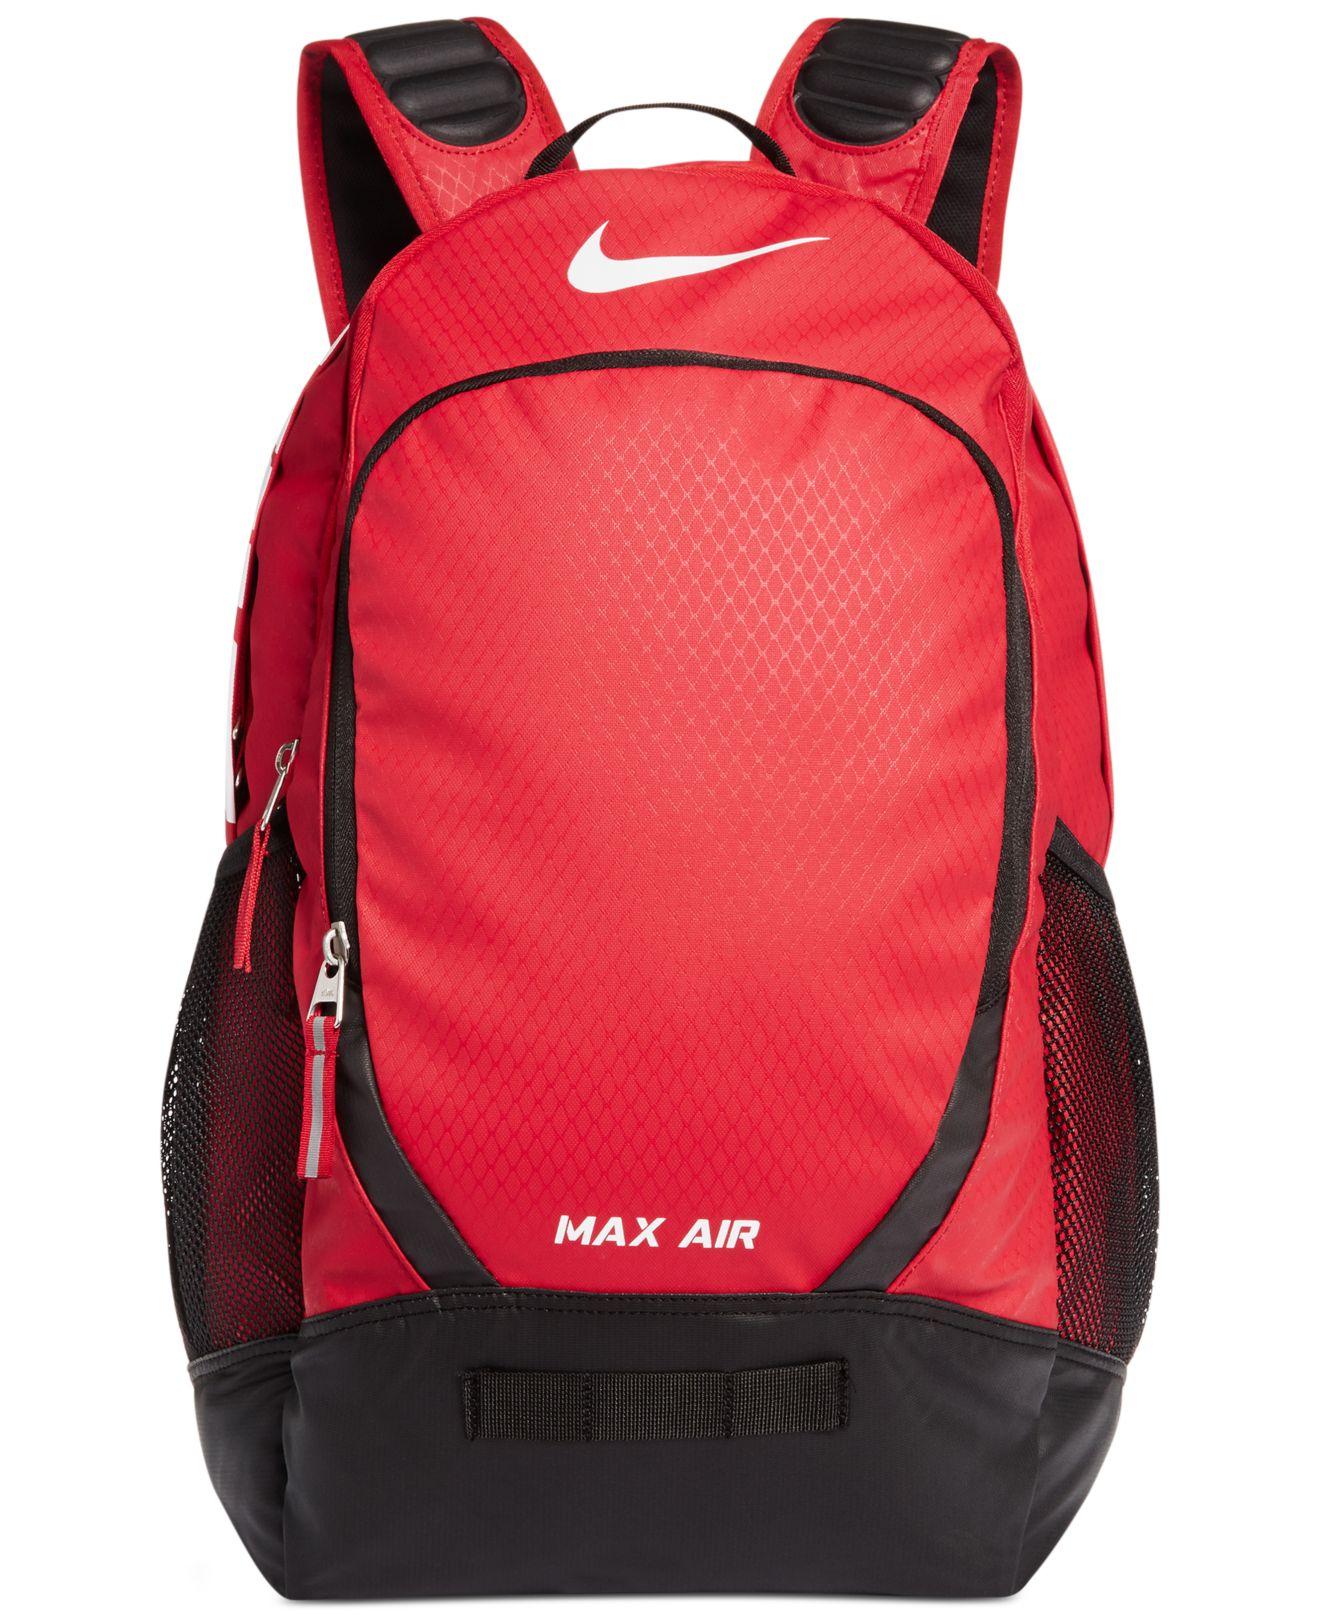 06b6be5064d0 Nike Max Air Team Training Extra Large Duffel Bag